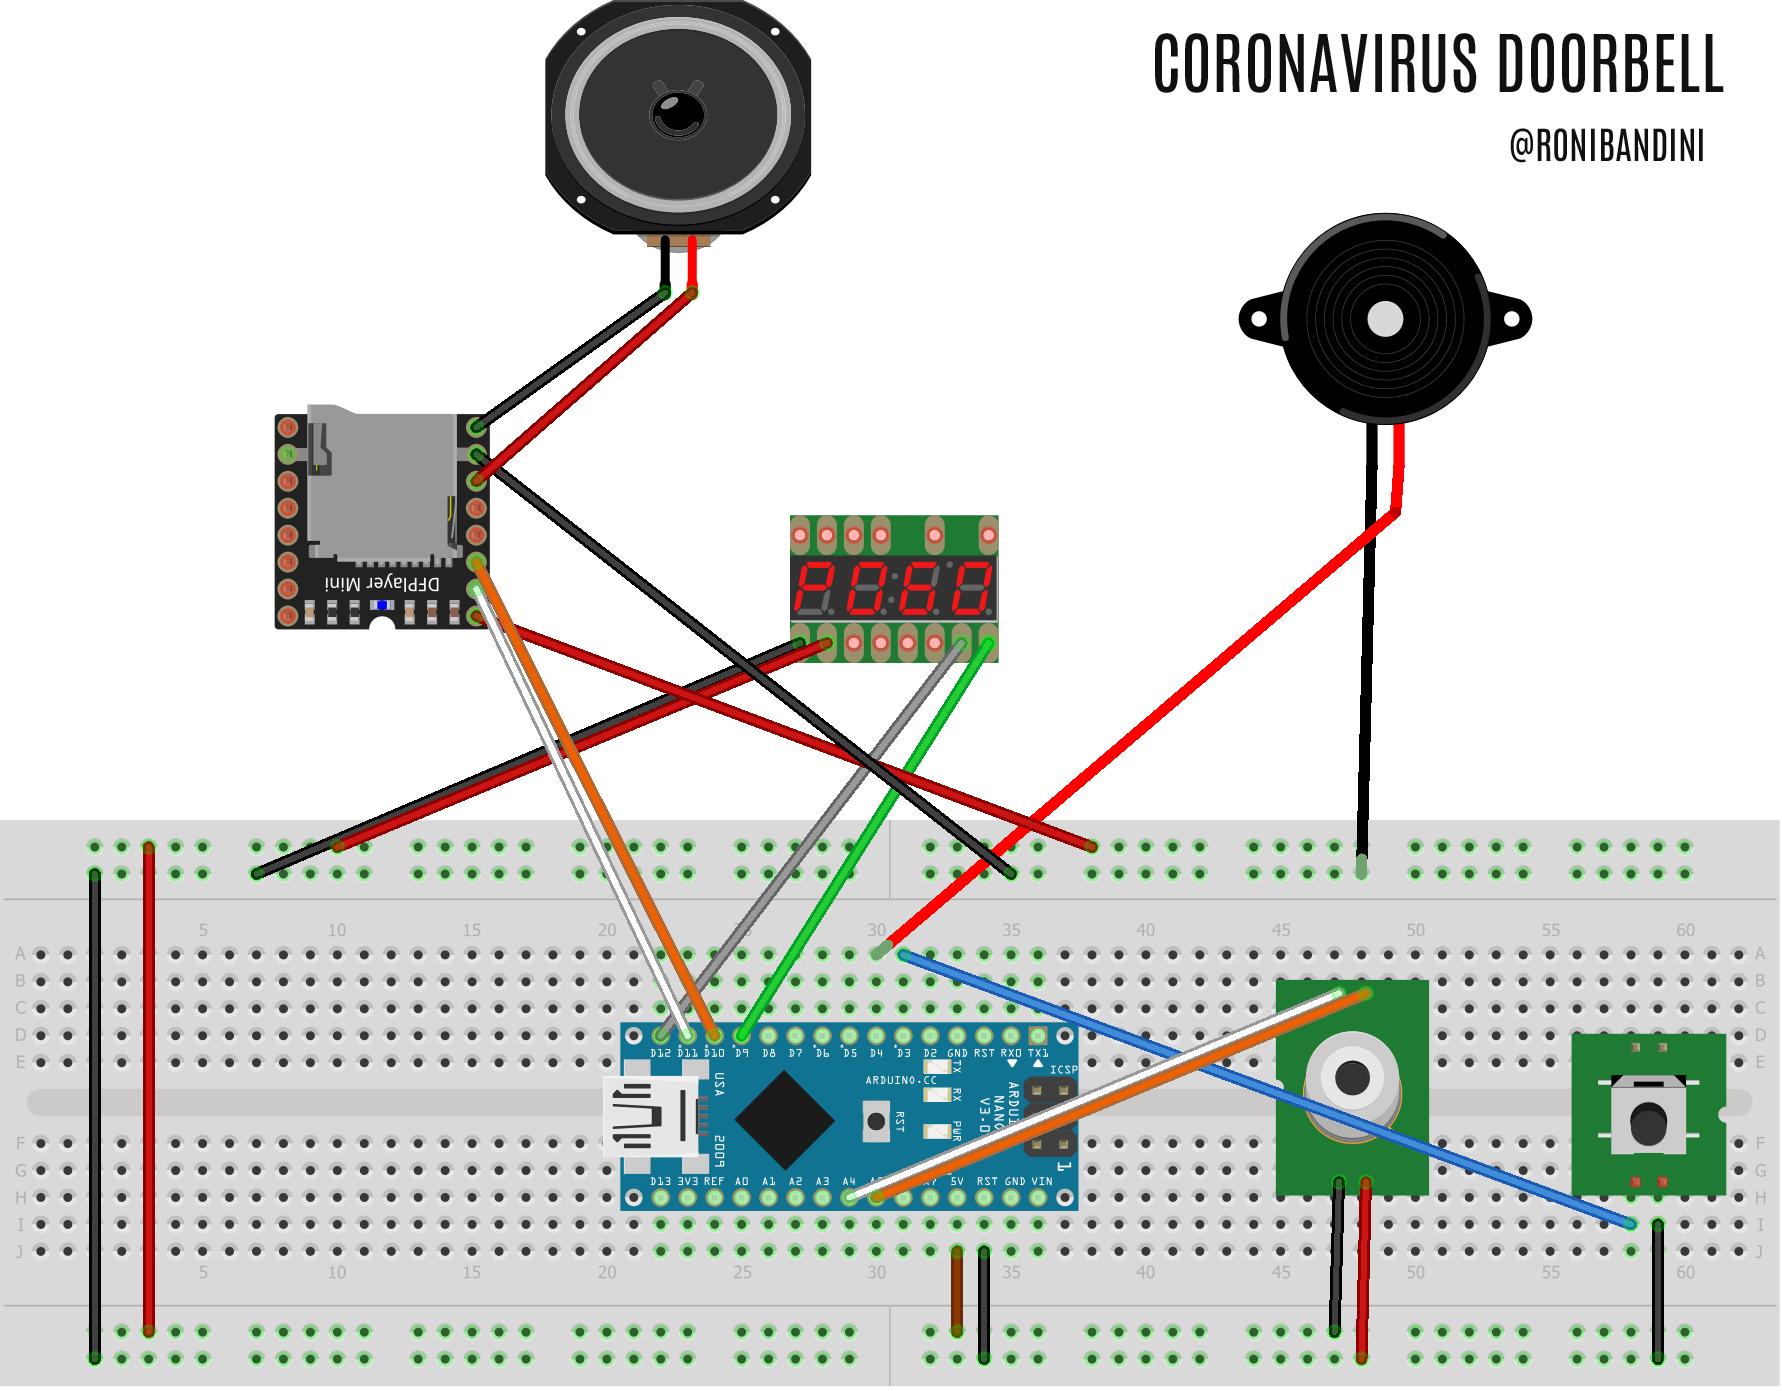 Coronavirusdoorbell circuito g0usyeolua